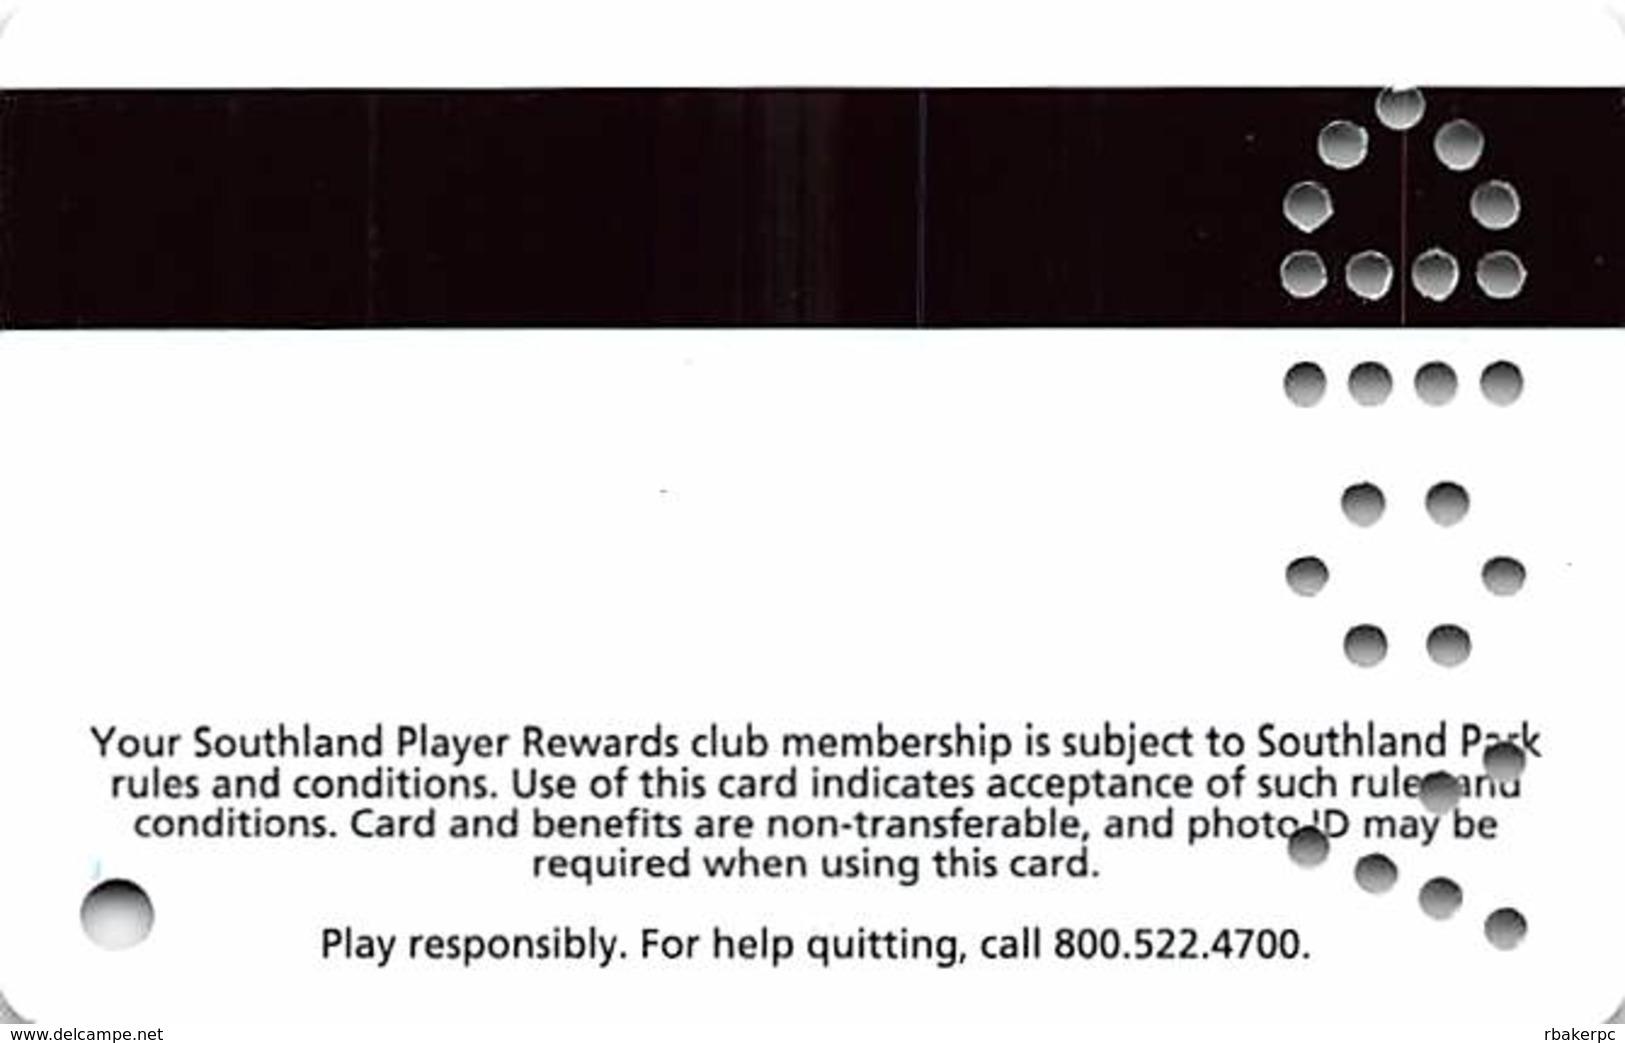 Southland Park Gaming - W. Memphis, AR - Blank Sample Slot Card - Casino Cards